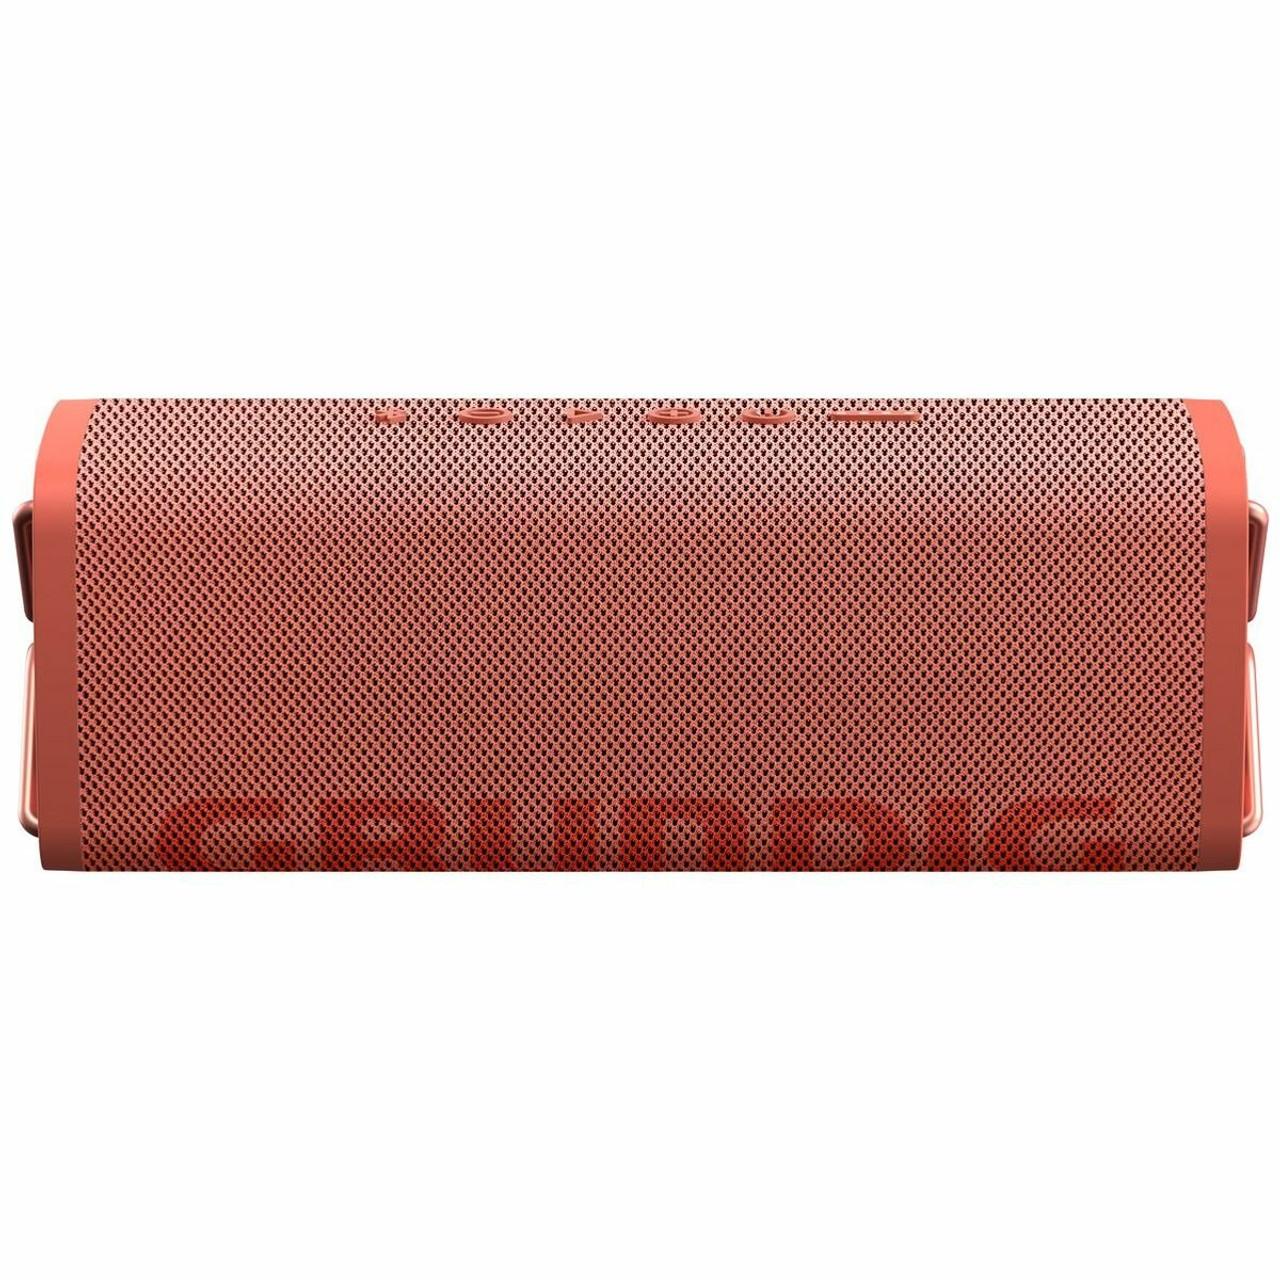 Grundig GLR7761/GLR7762 CLUB Waterproof Portable Bluetooth Speaker - Black/Coral